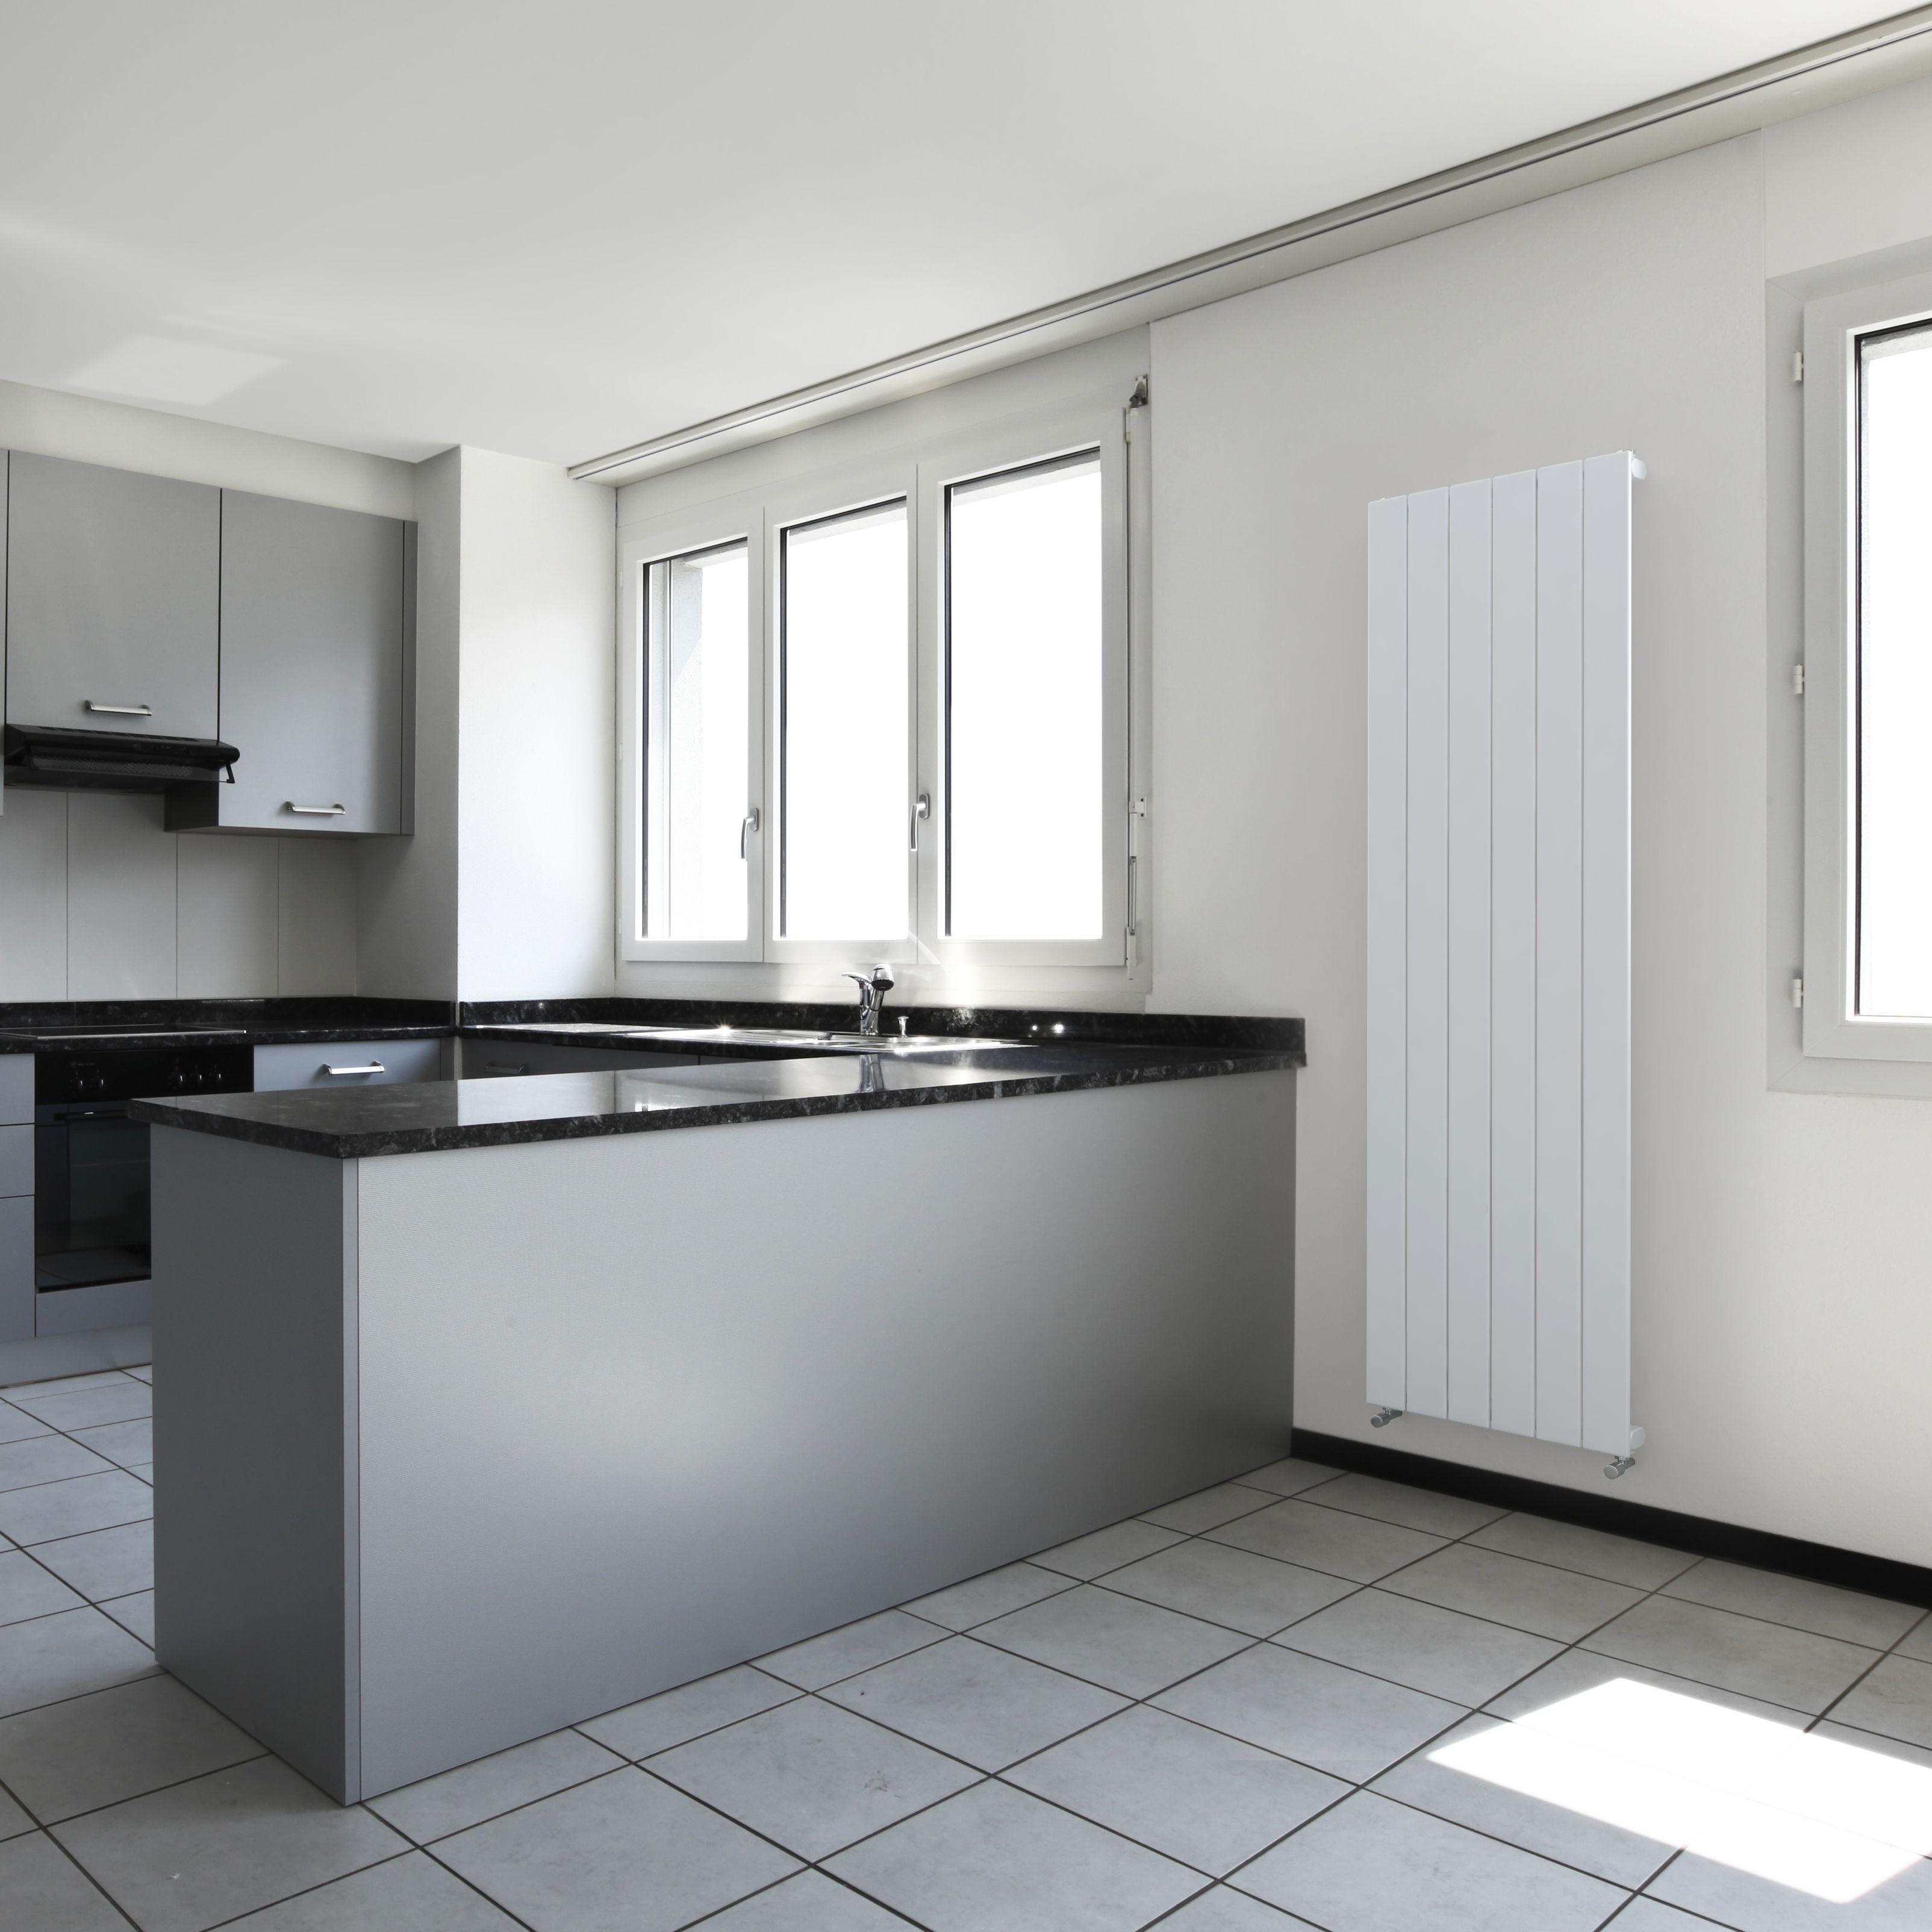 Seren Égalrad Type 10 single Designer panel radiator